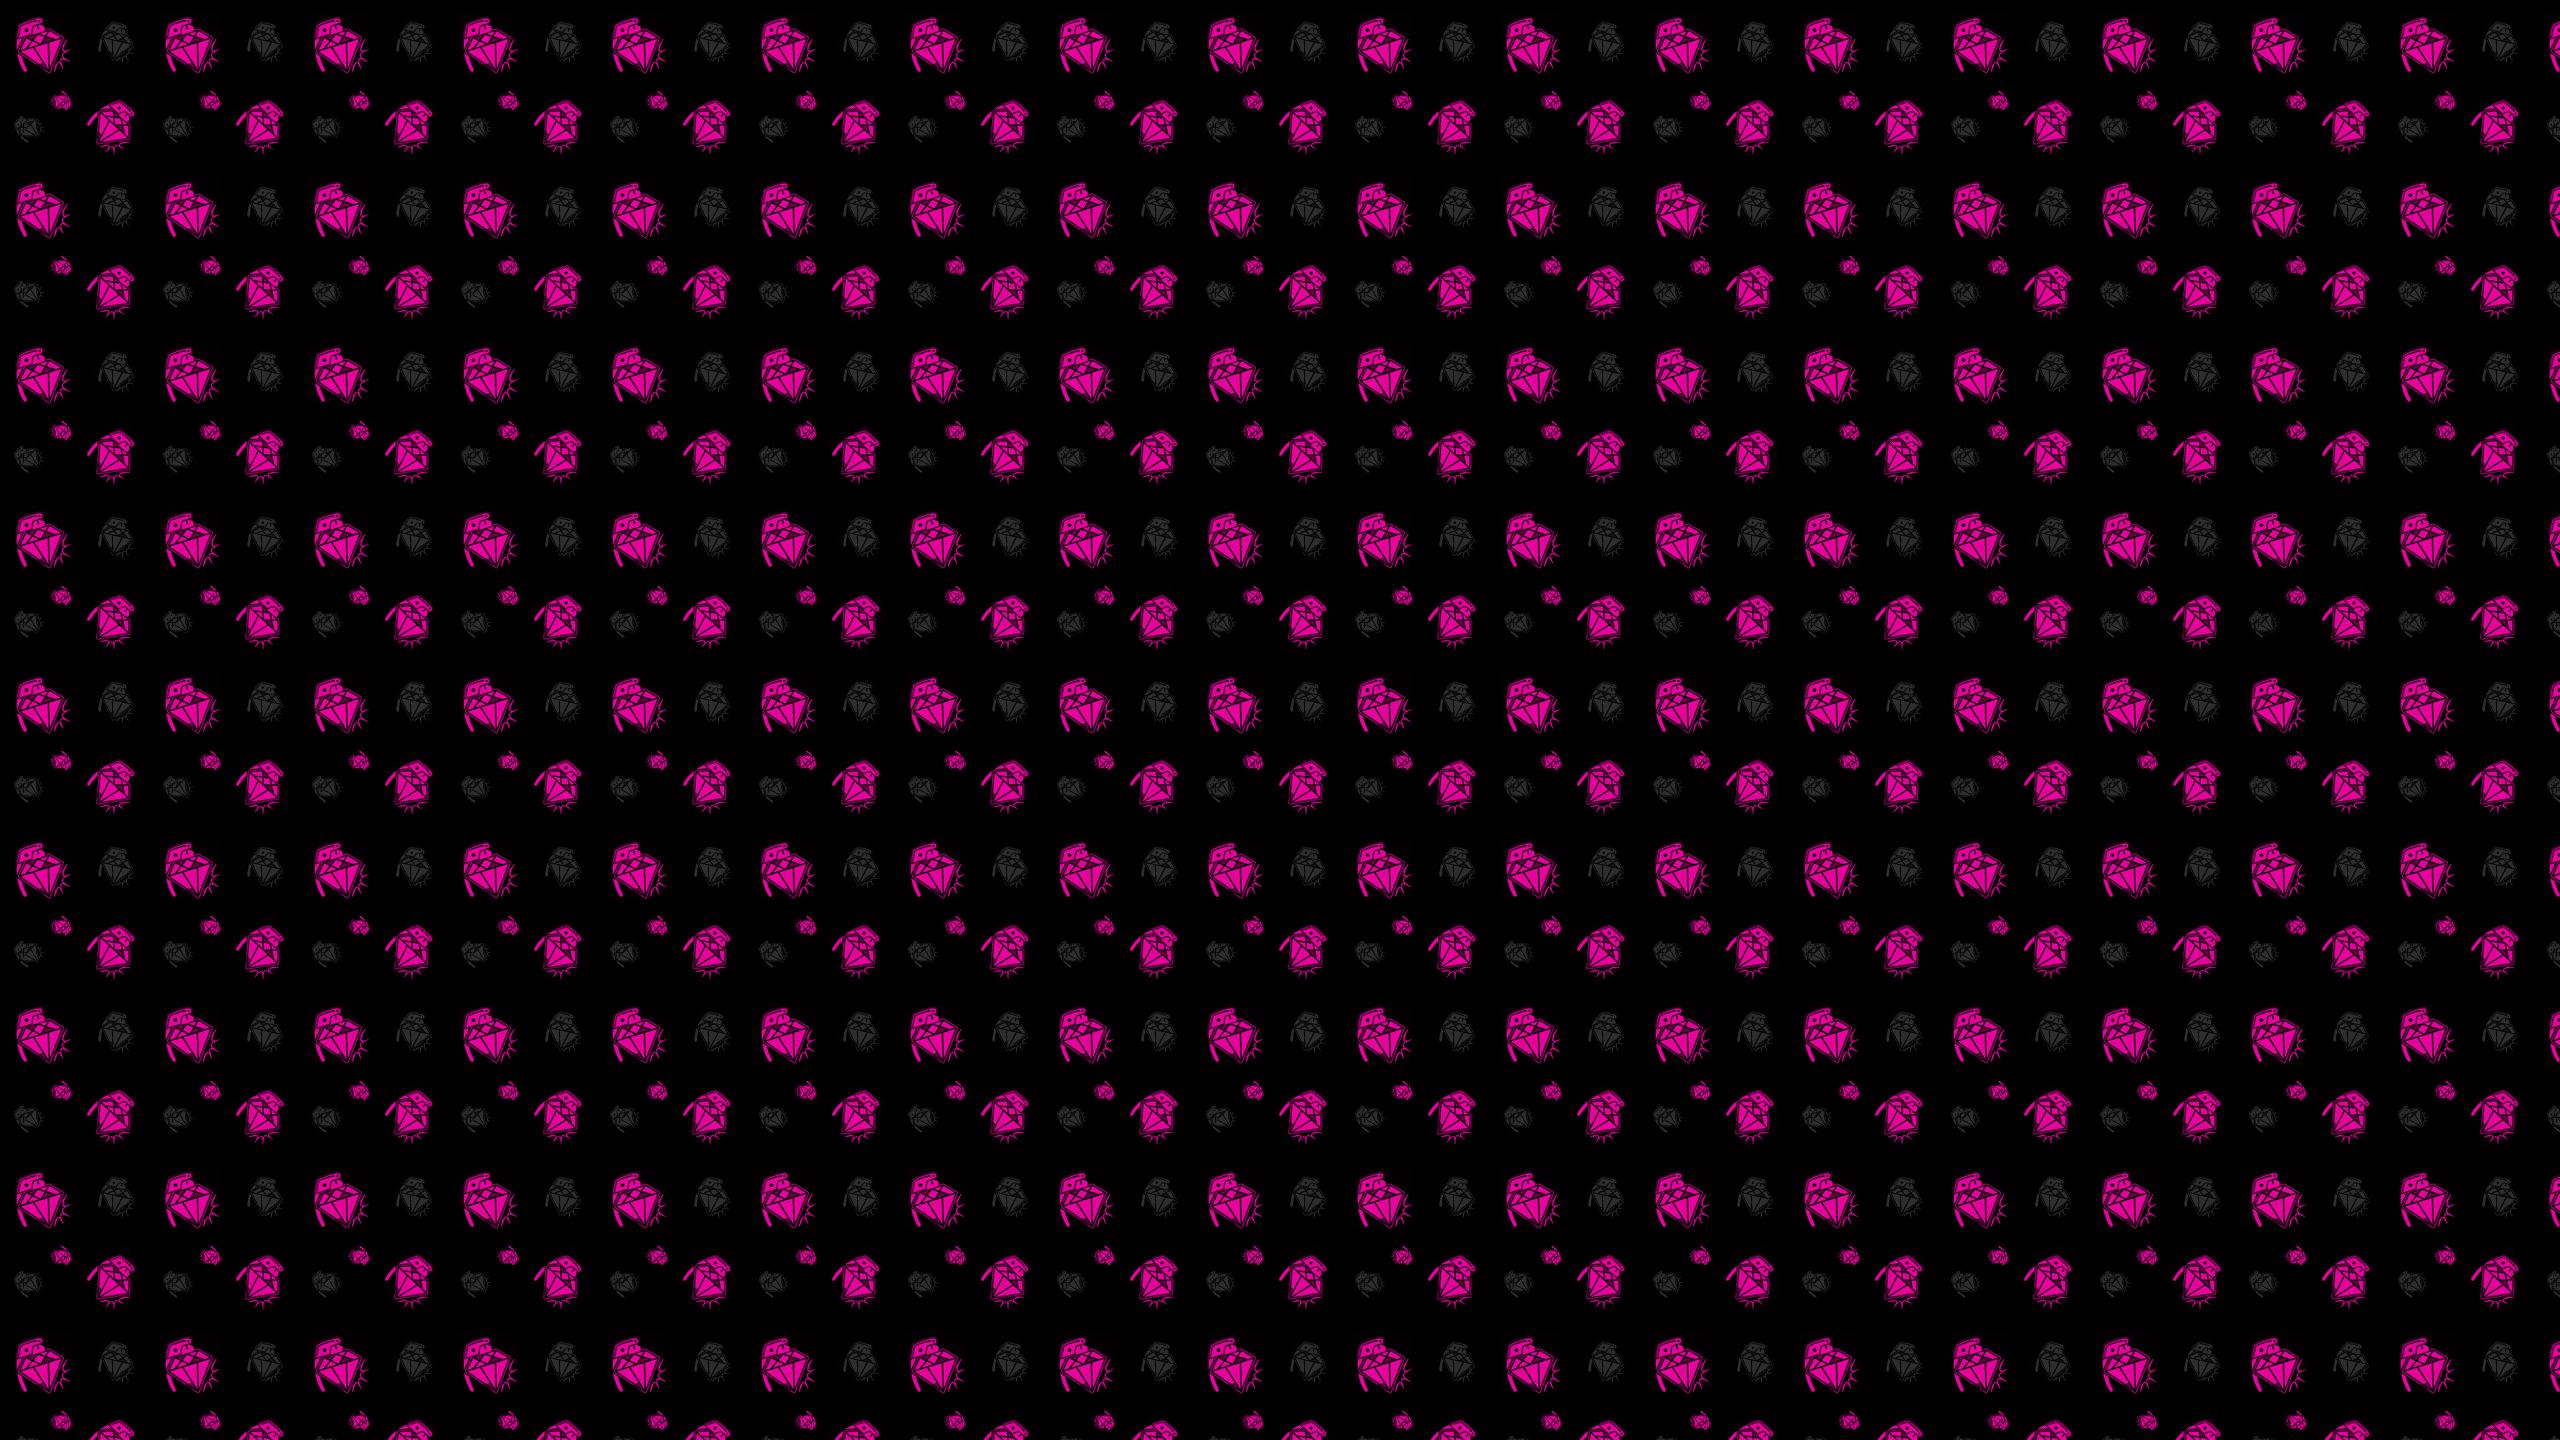 Pink Diamond Wallpapers Group 42